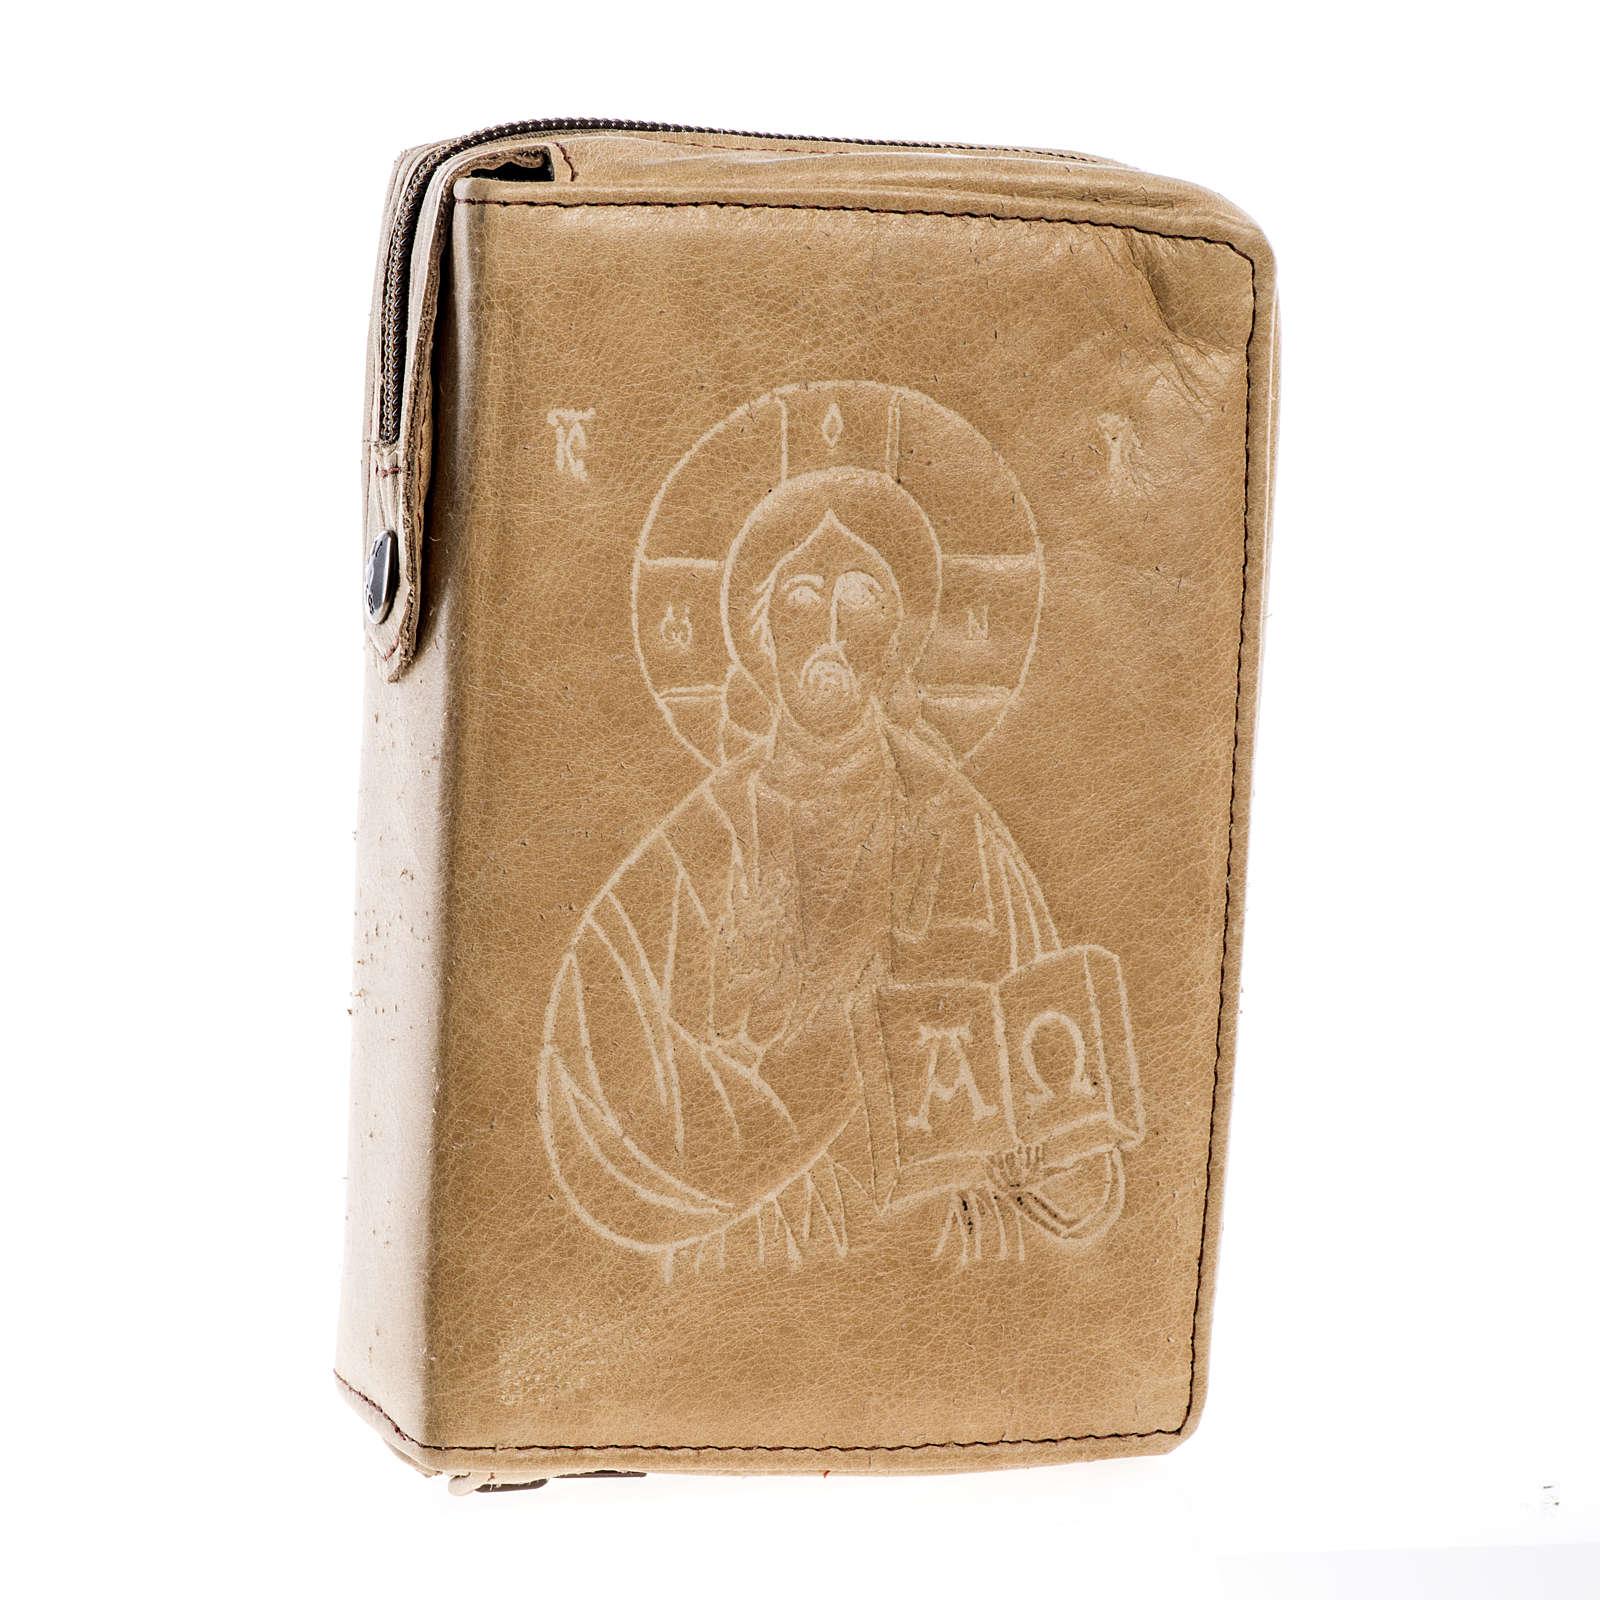 Custodia lit. 4 vol. Gesù Pantocratico marrone chiaro 4